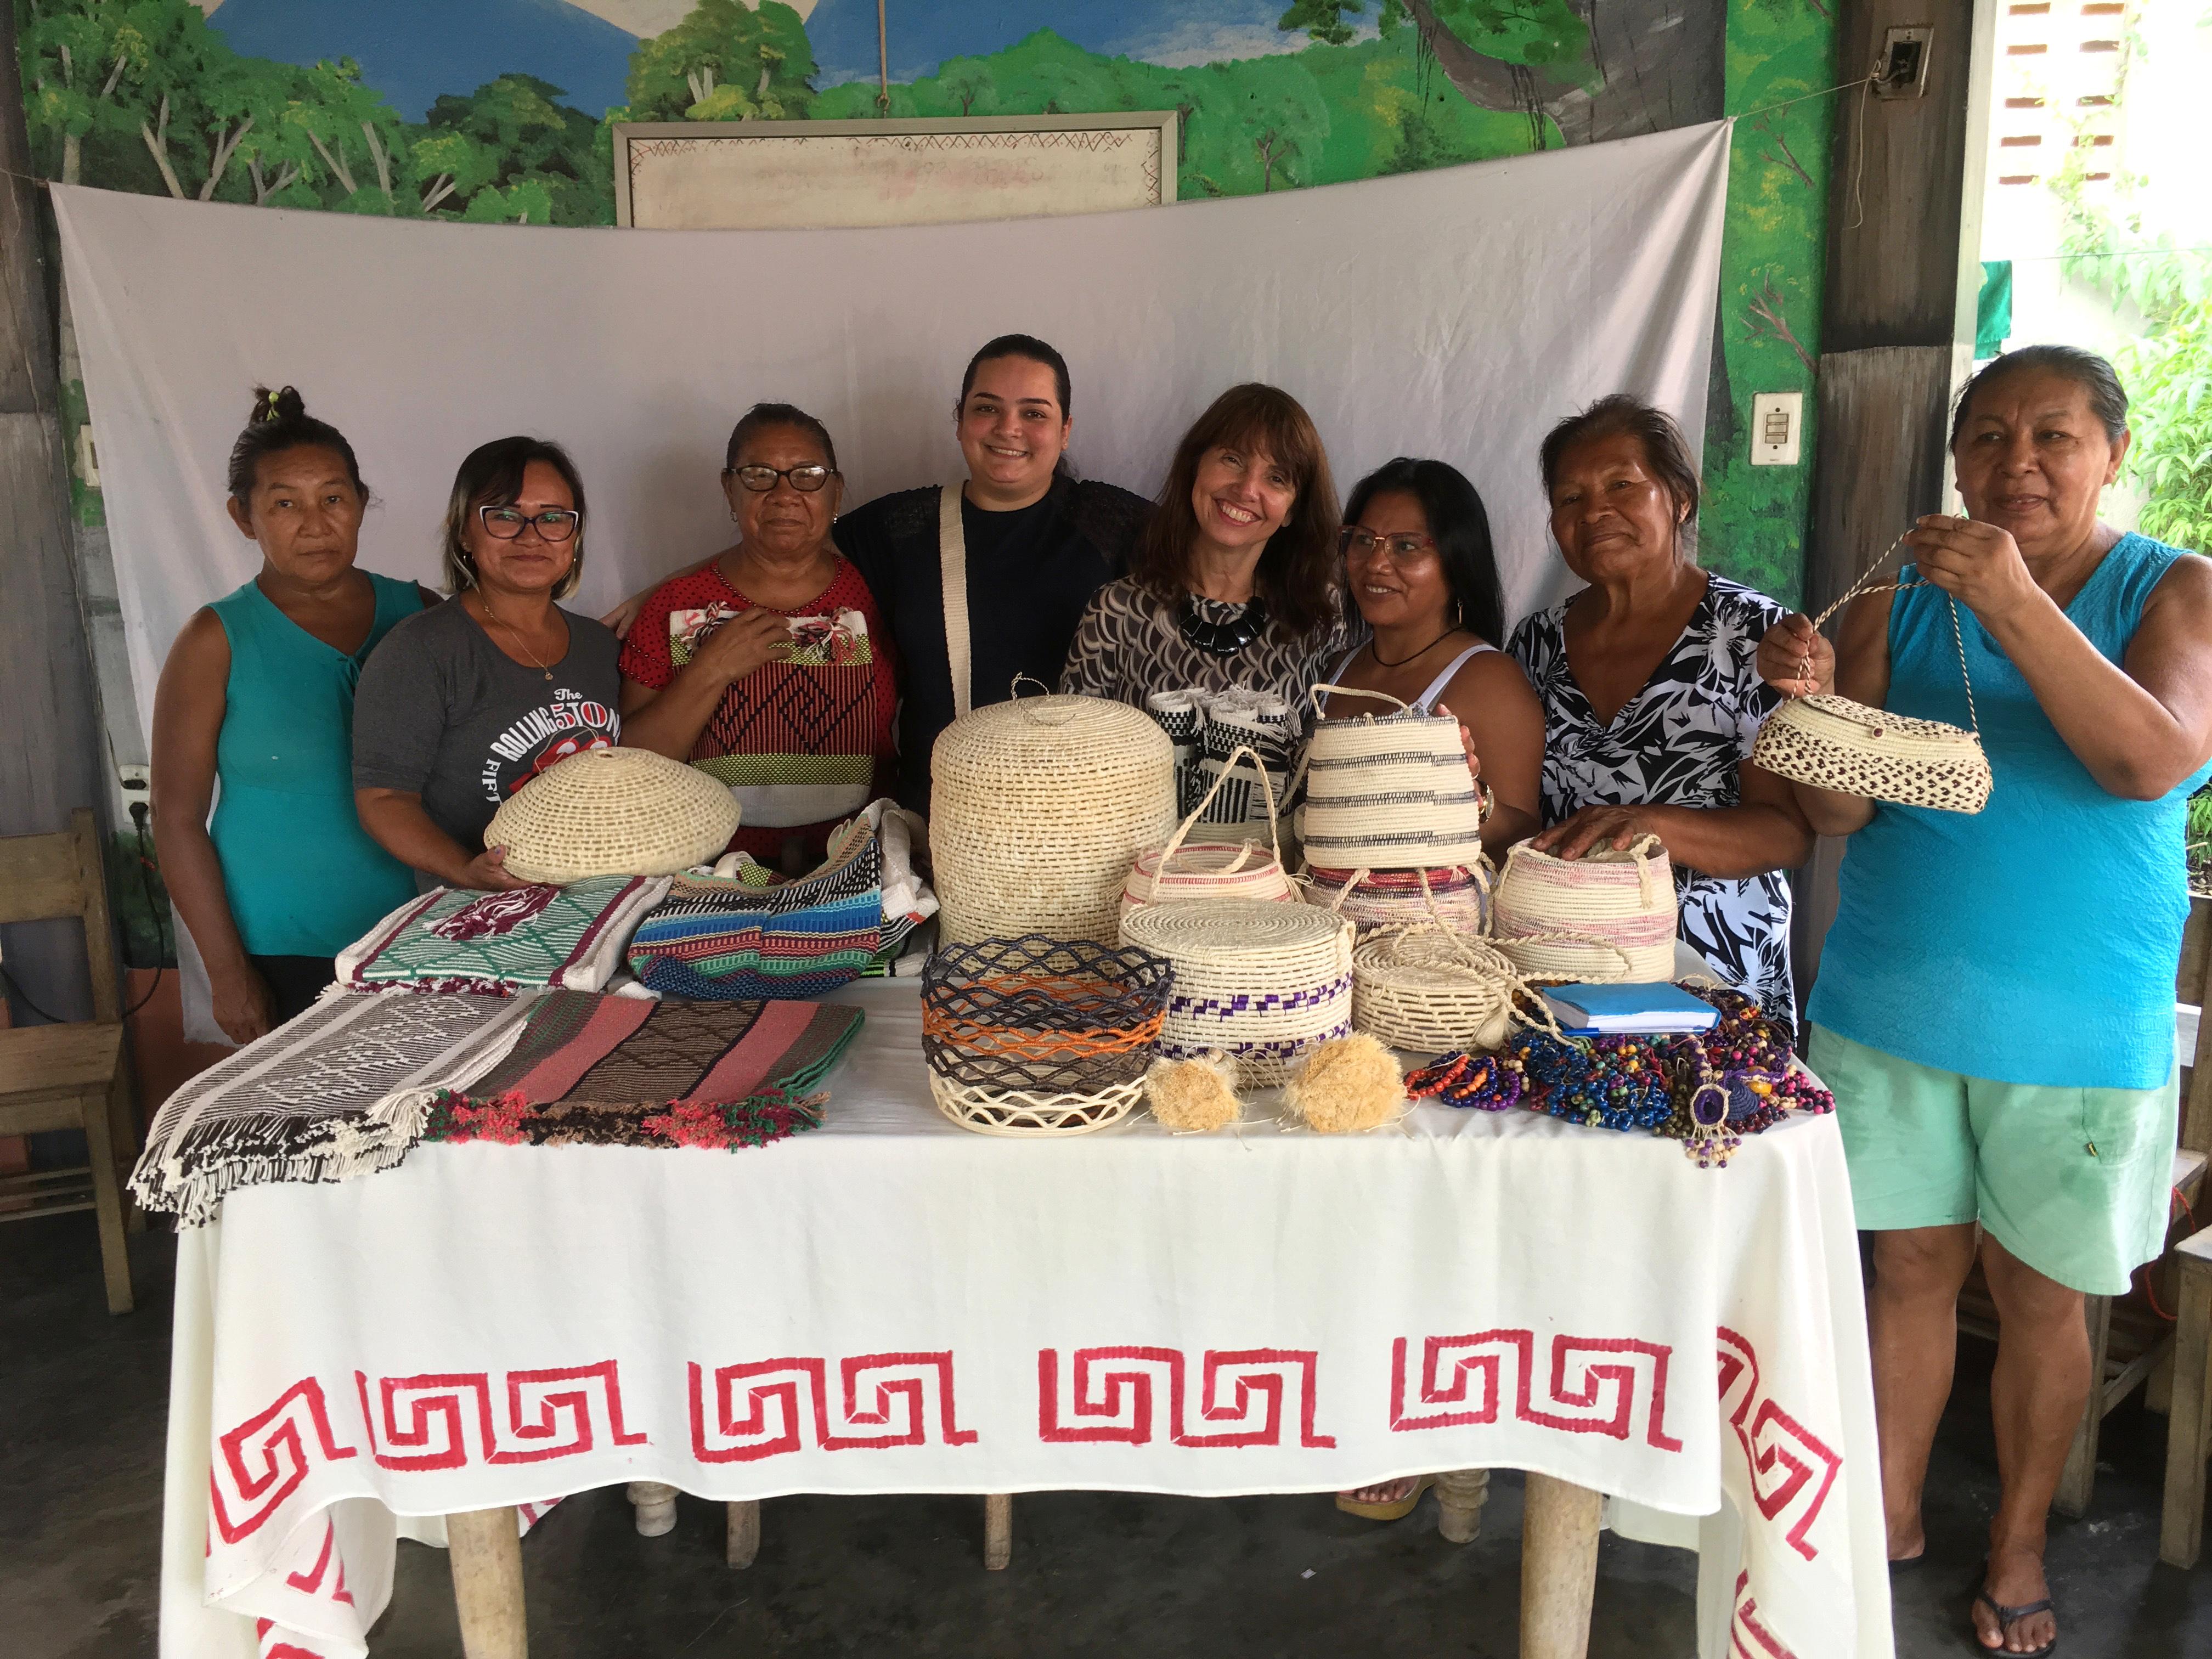 Zagaia Amazônia BrazilFoundation Filantropia Philanthropy